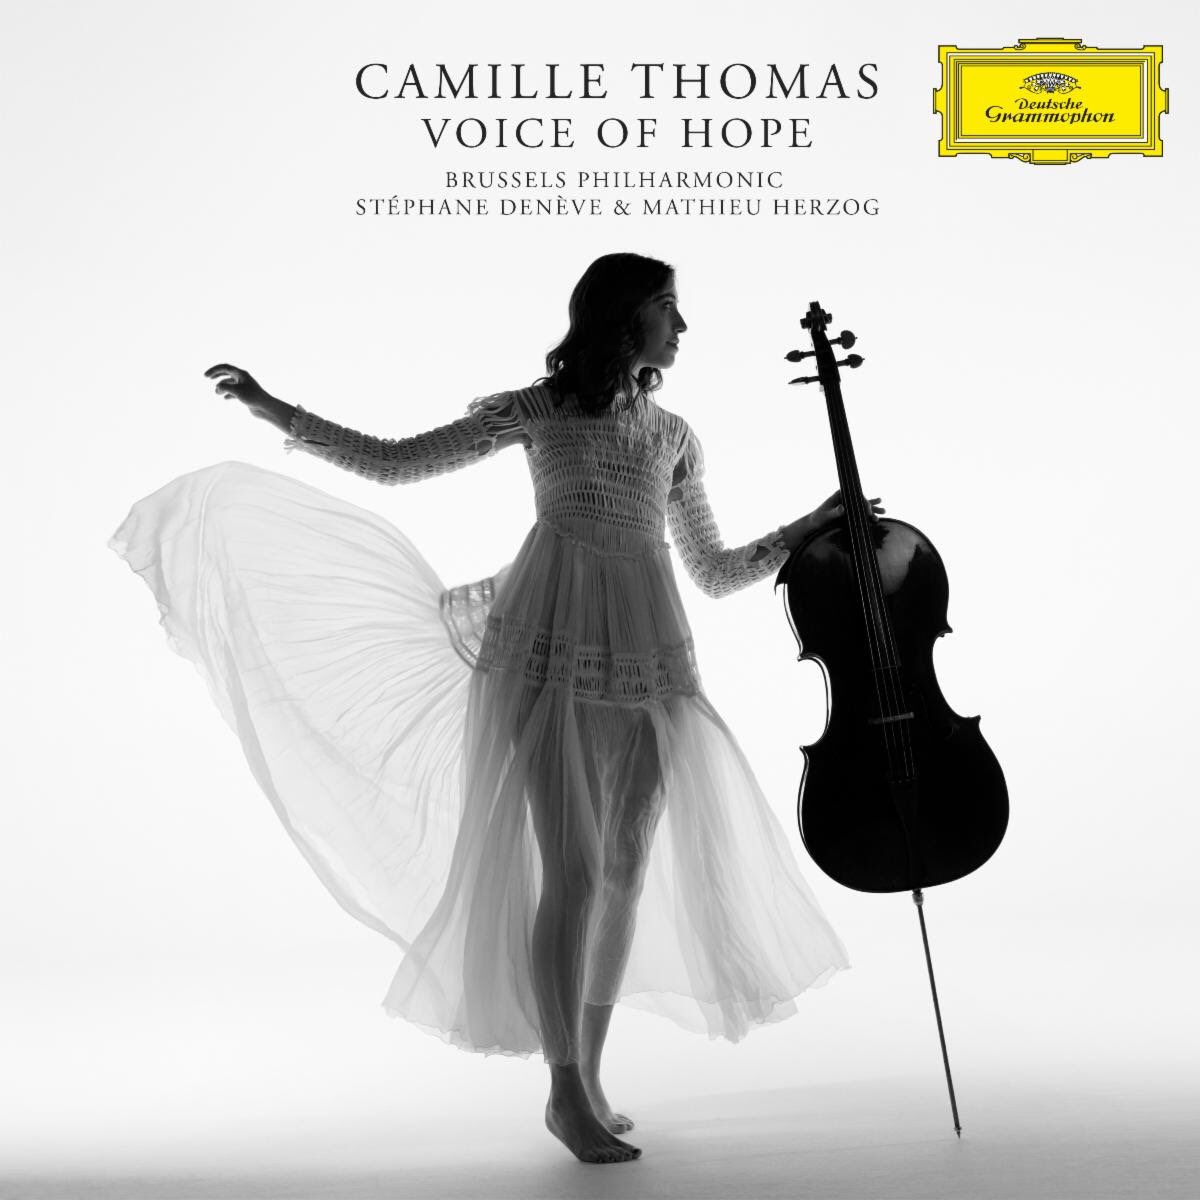 Camille Thomas's latest album, Voice of Hope, tops Lisa Flynn's New Releases list for @WFMTclassical. You can hear the Ravel track on Lisa Flynn's @Spotify playlist. • • #camillethomas @CamilleThomasOF #newrecord #newreleasepic.twitter.com/1fjVeRIo08